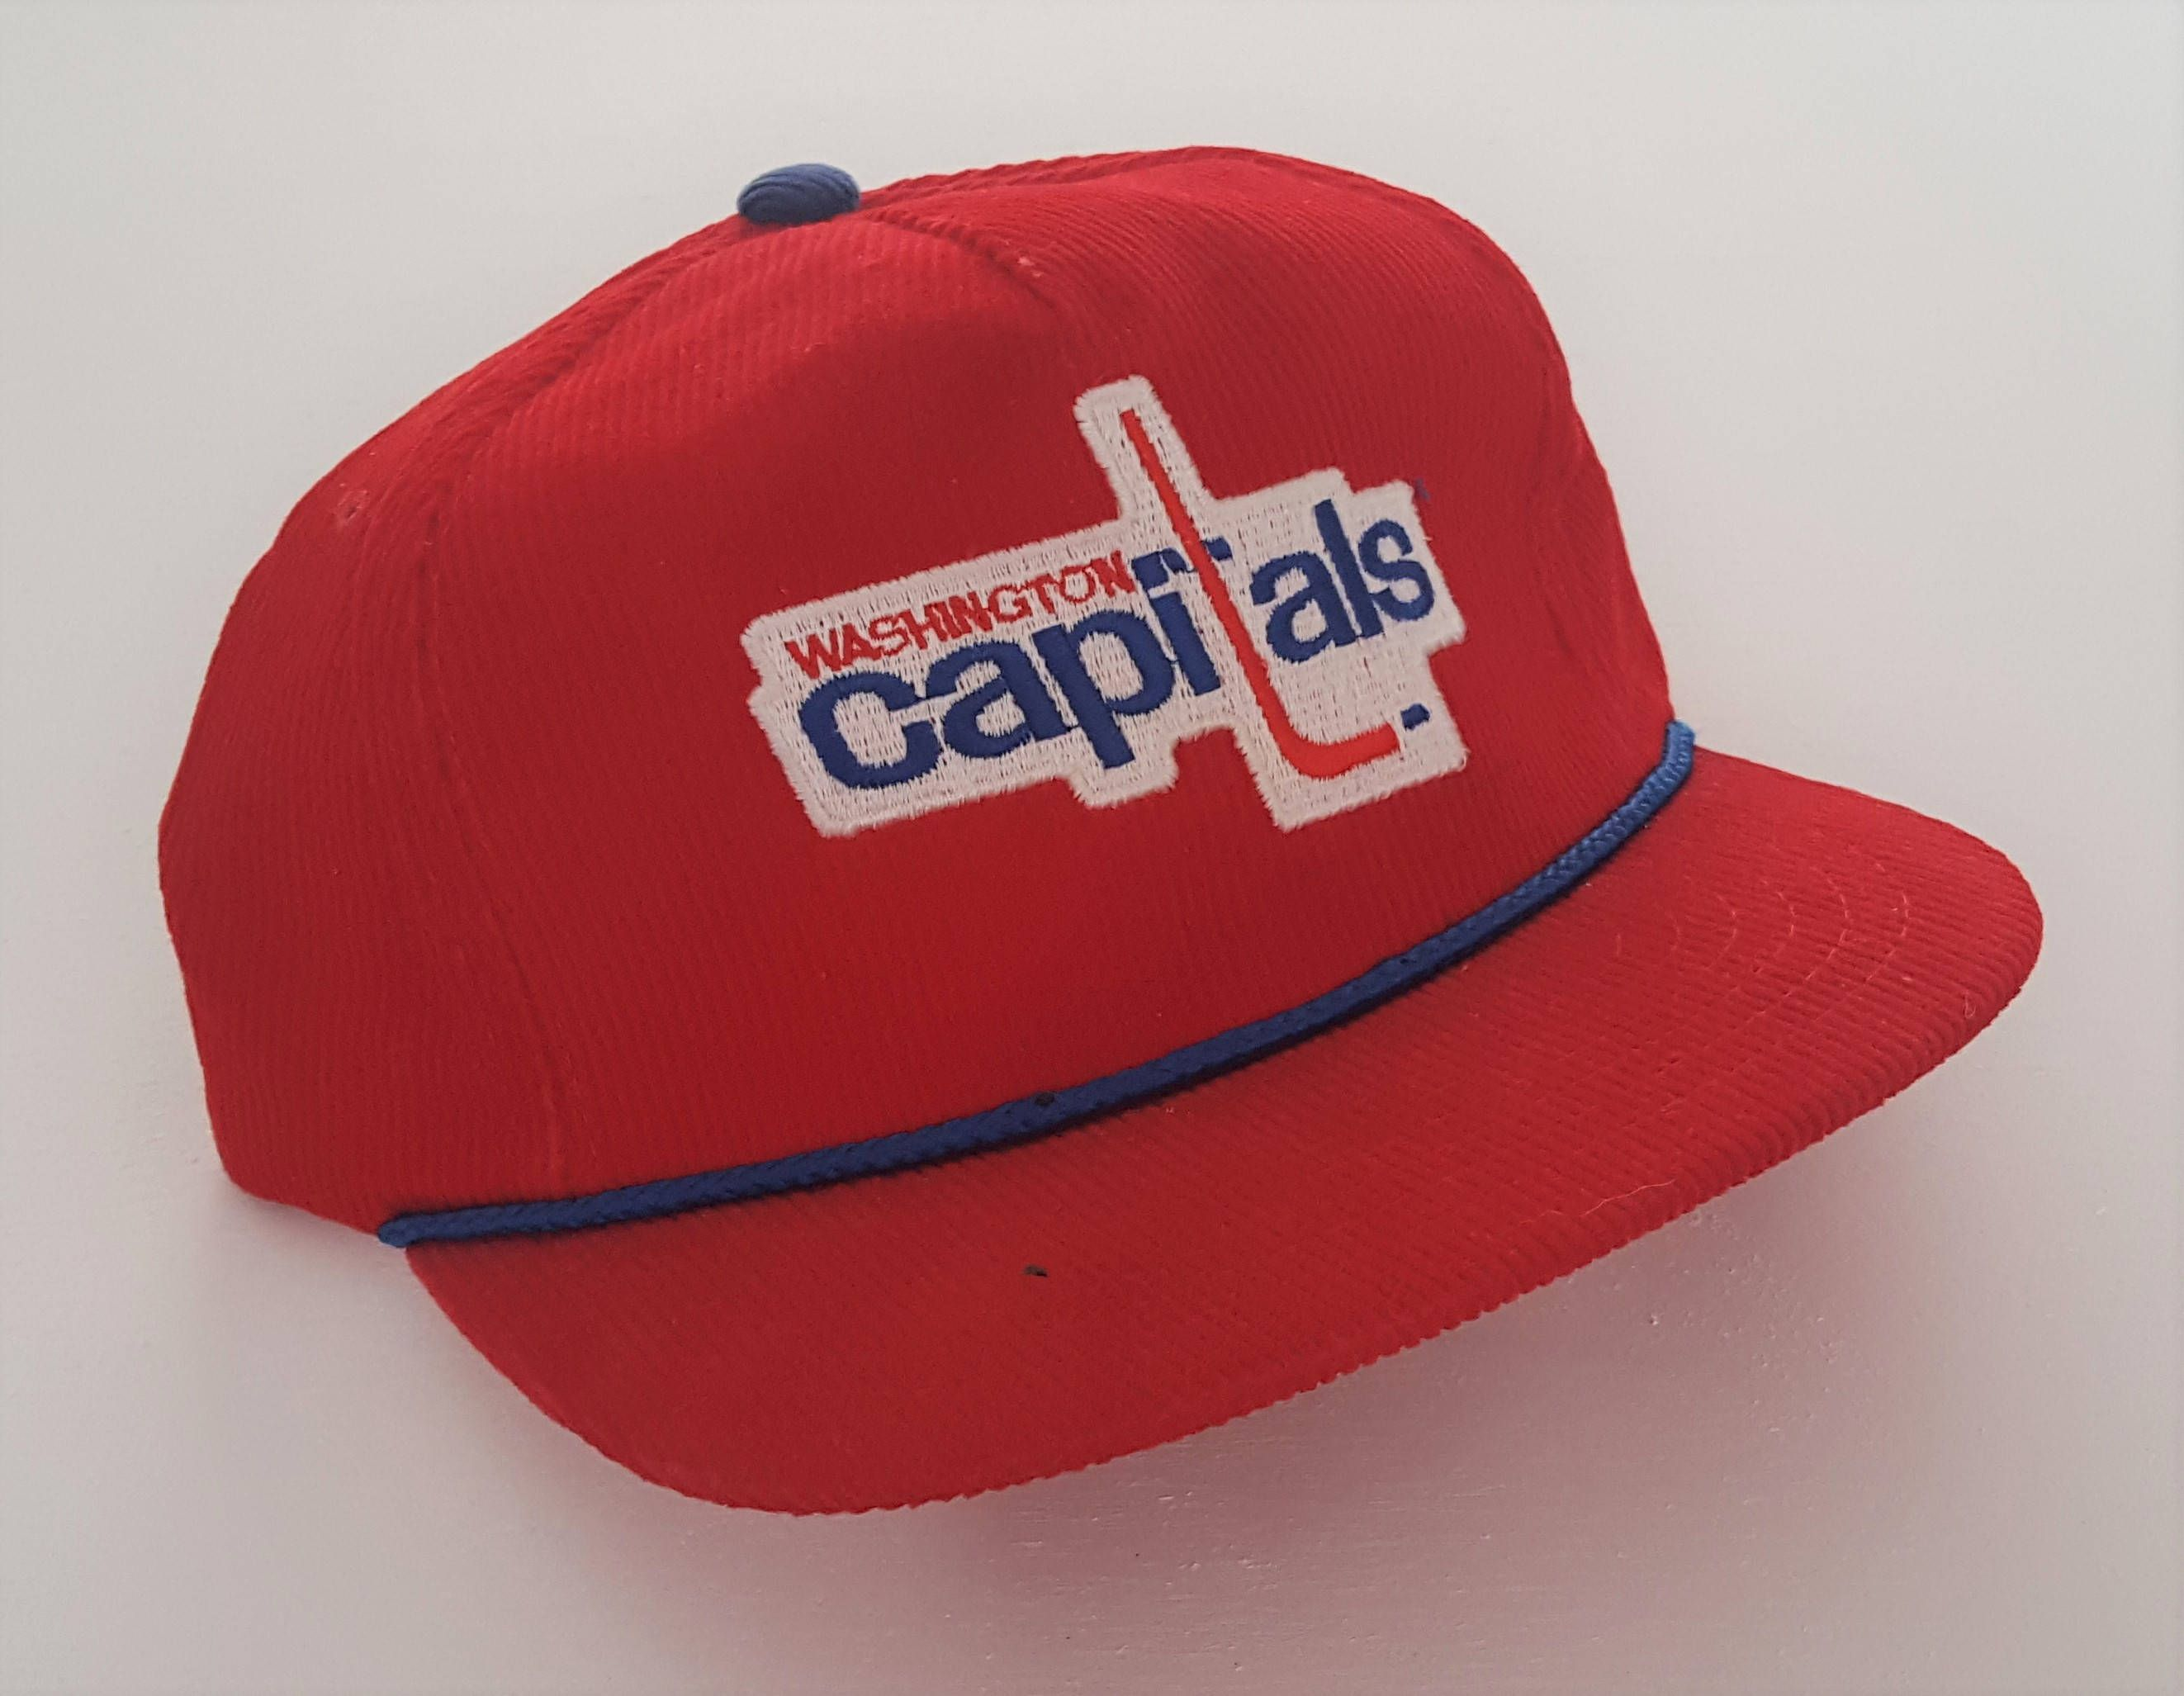 Vintage Washington Capitals Ted Fletcher Snapback Hat NHL VTG by  StreetwearAndVintage on Etsy 61ec53e8985